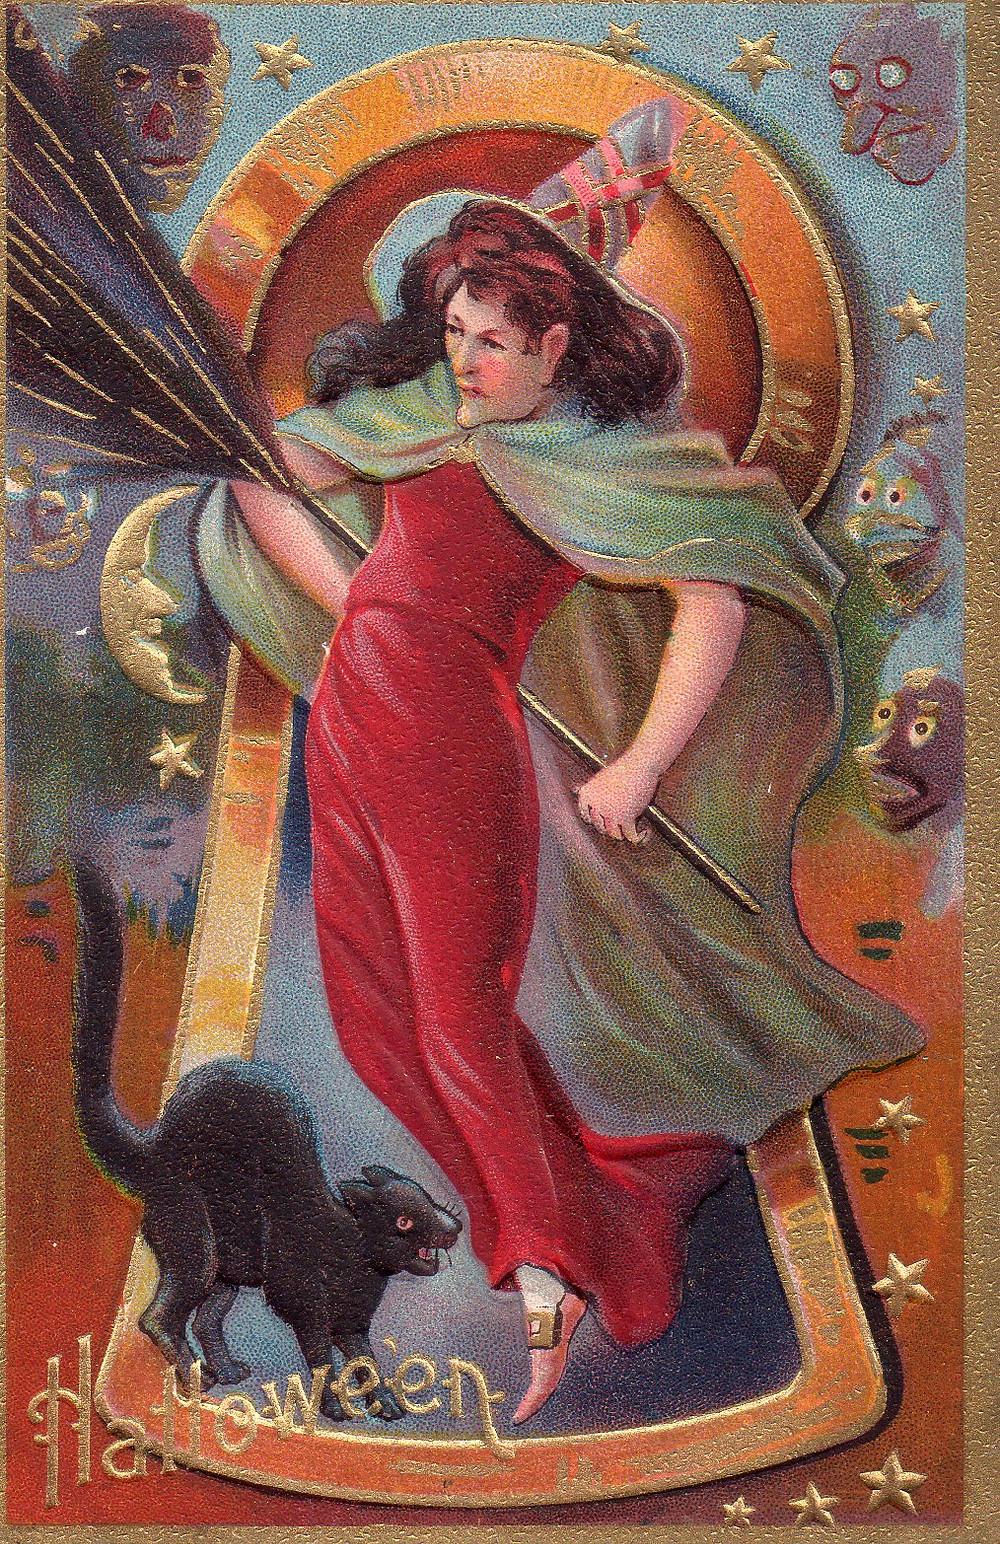 Vintage Witch Postcard